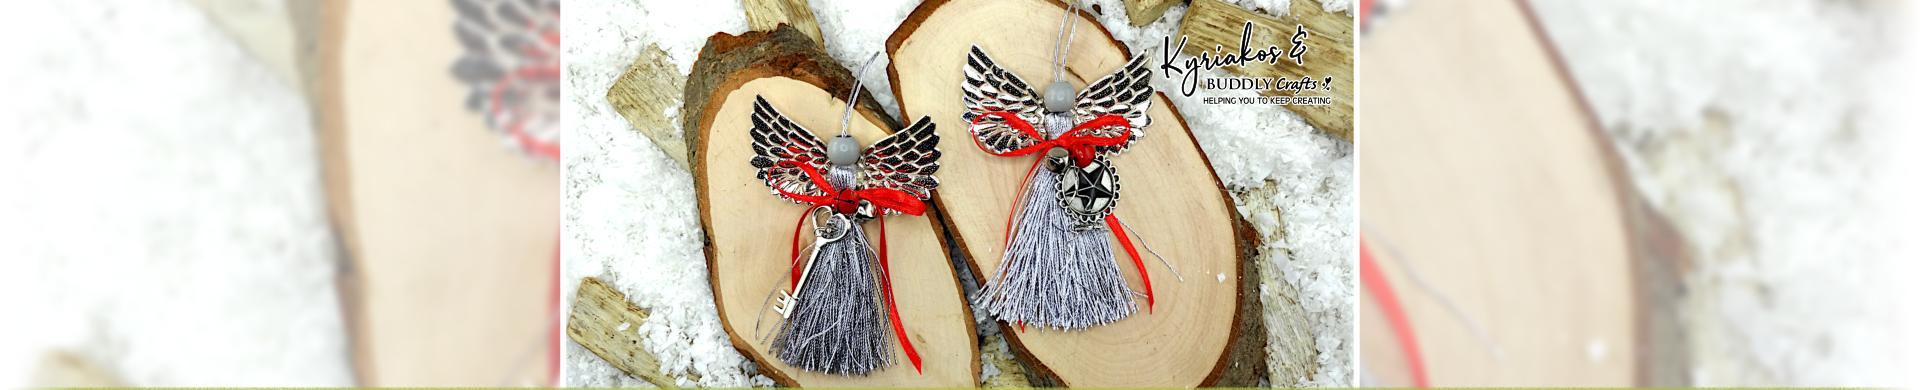 Tassel Angels Decorations